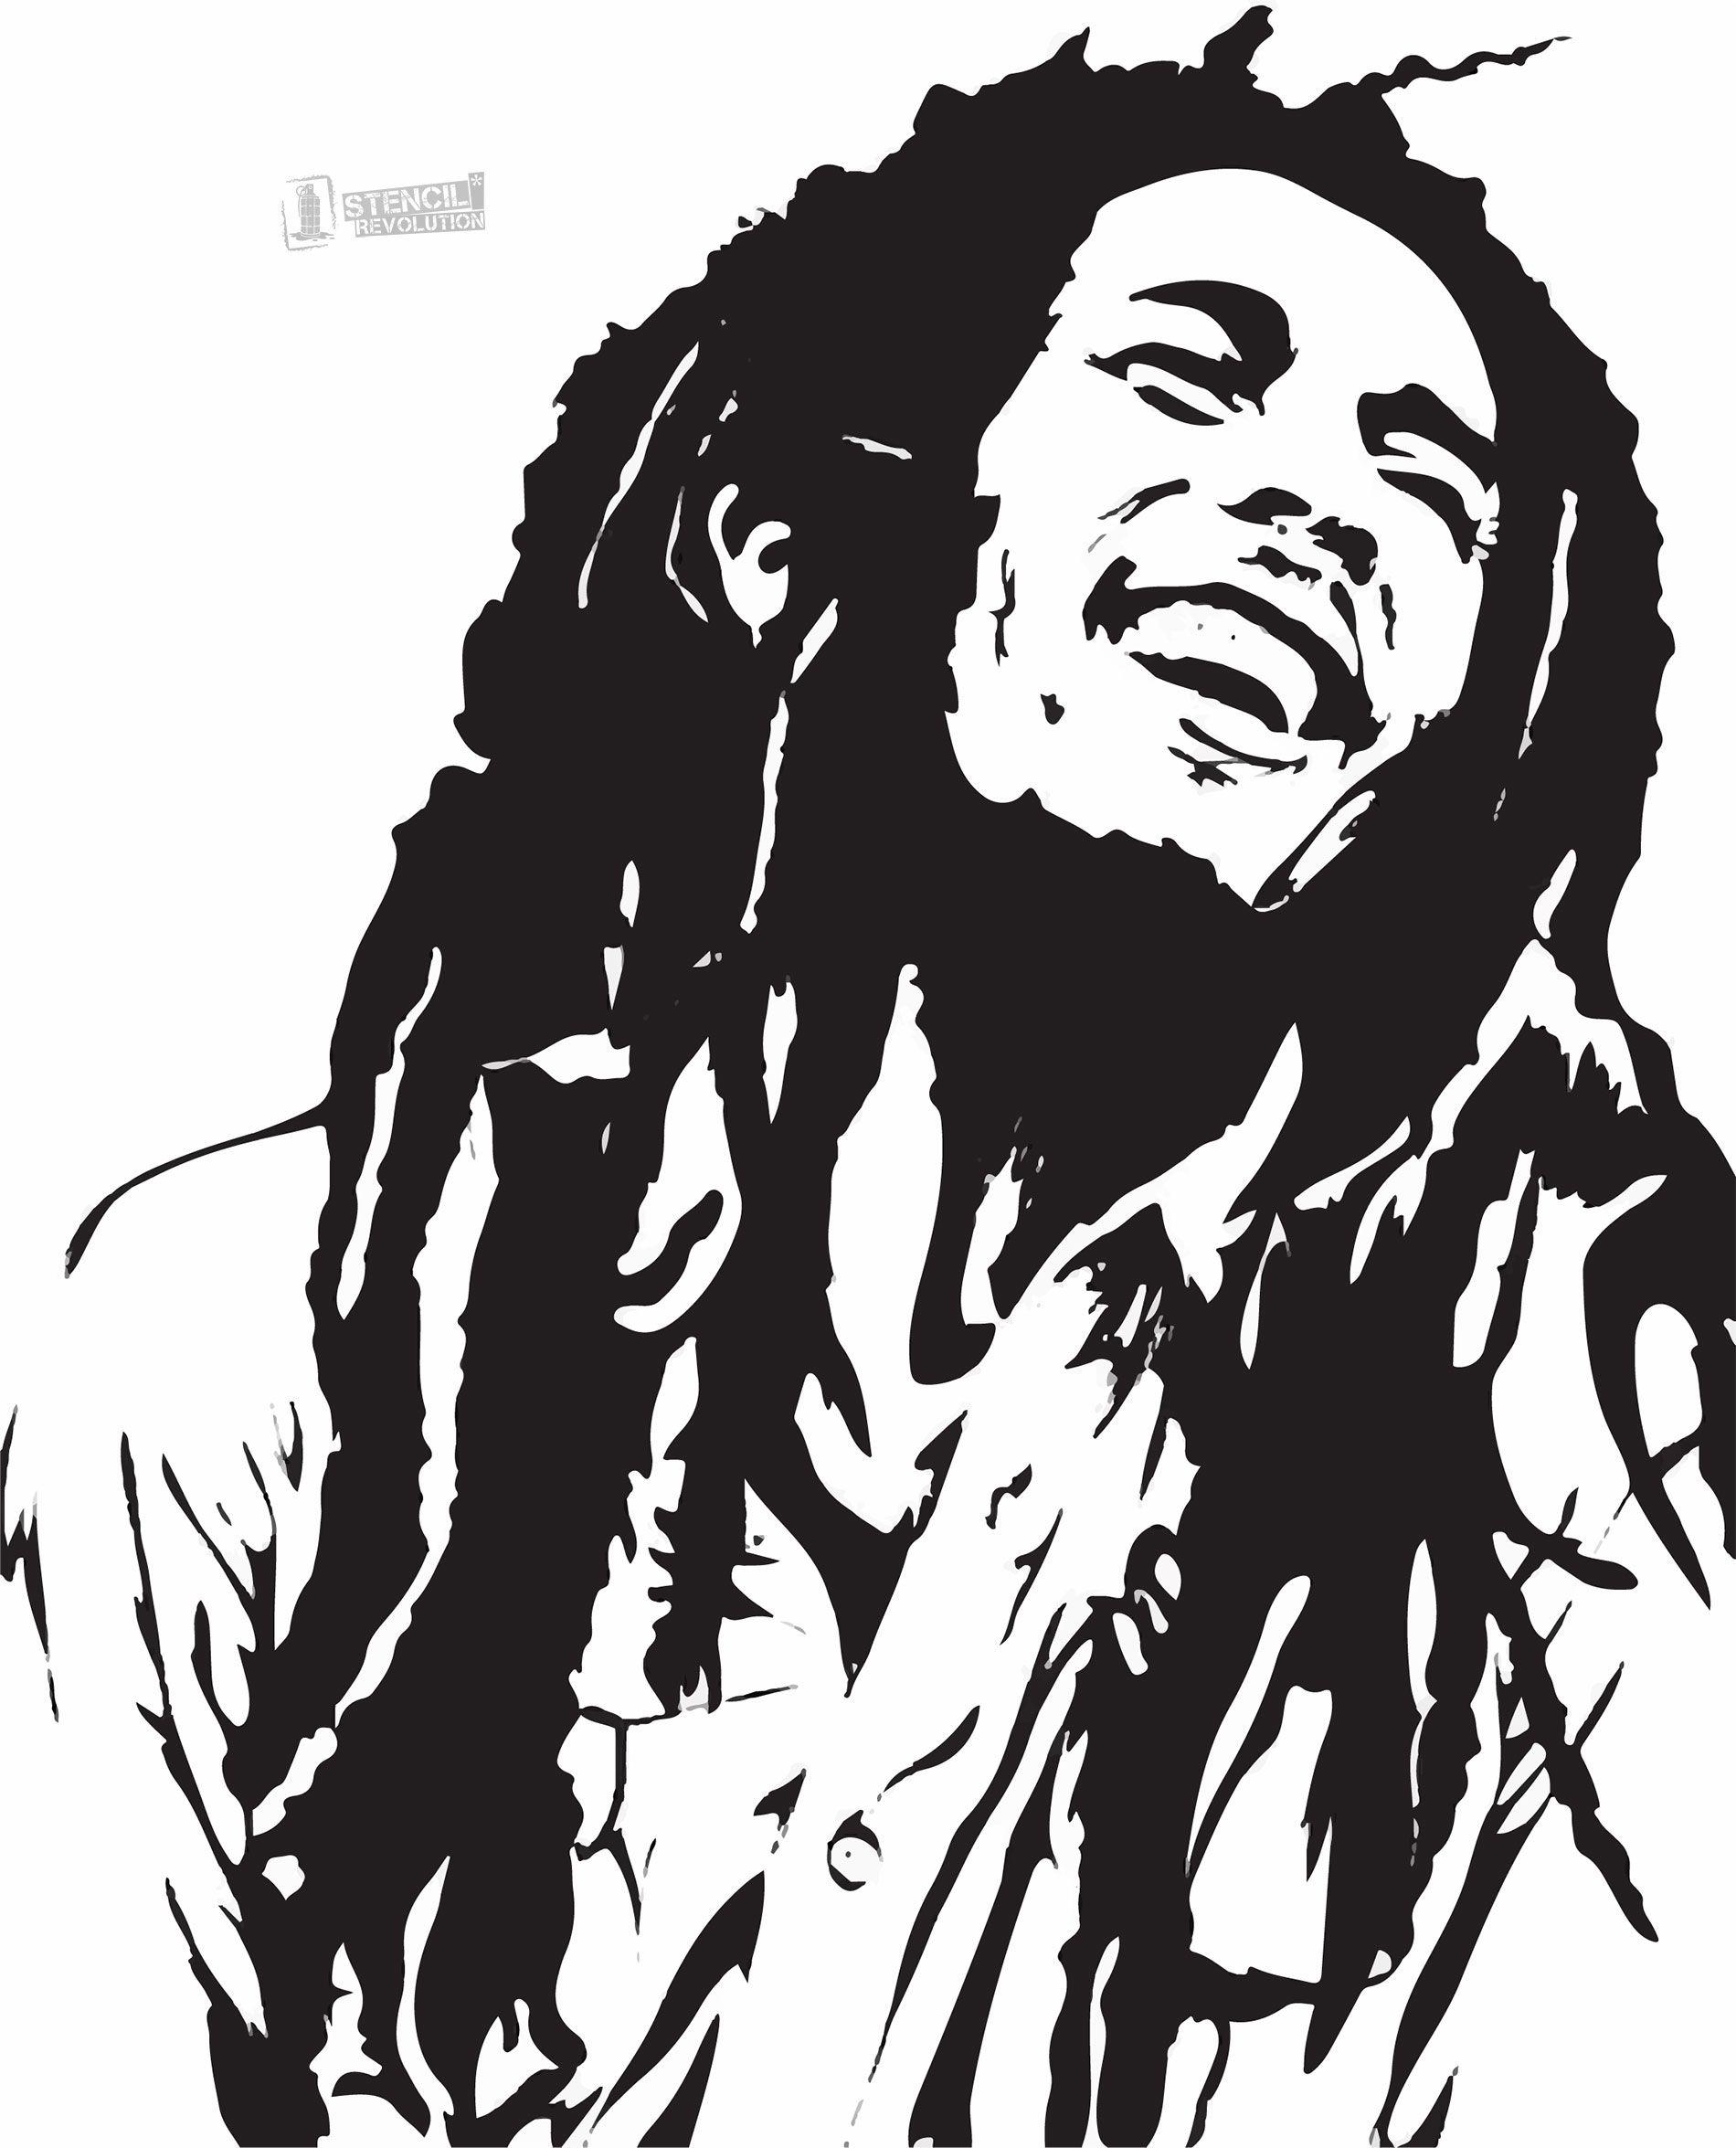 The Highest Quality Stencils At The Best Prices Bob Marley Art Bob Marley Tattoo Bob Marley